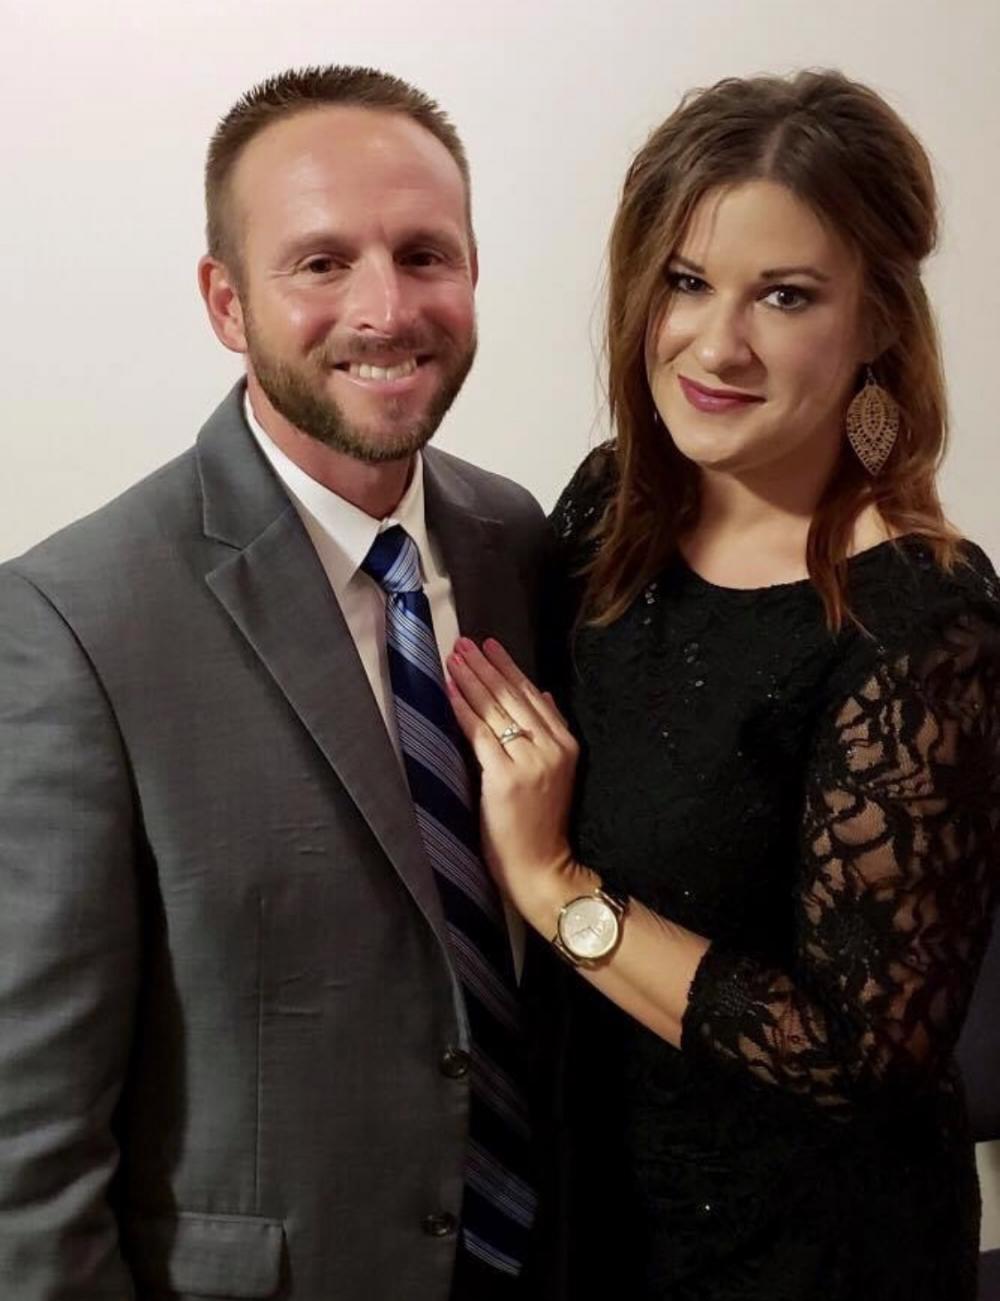 Chad and Stephanie Pugh